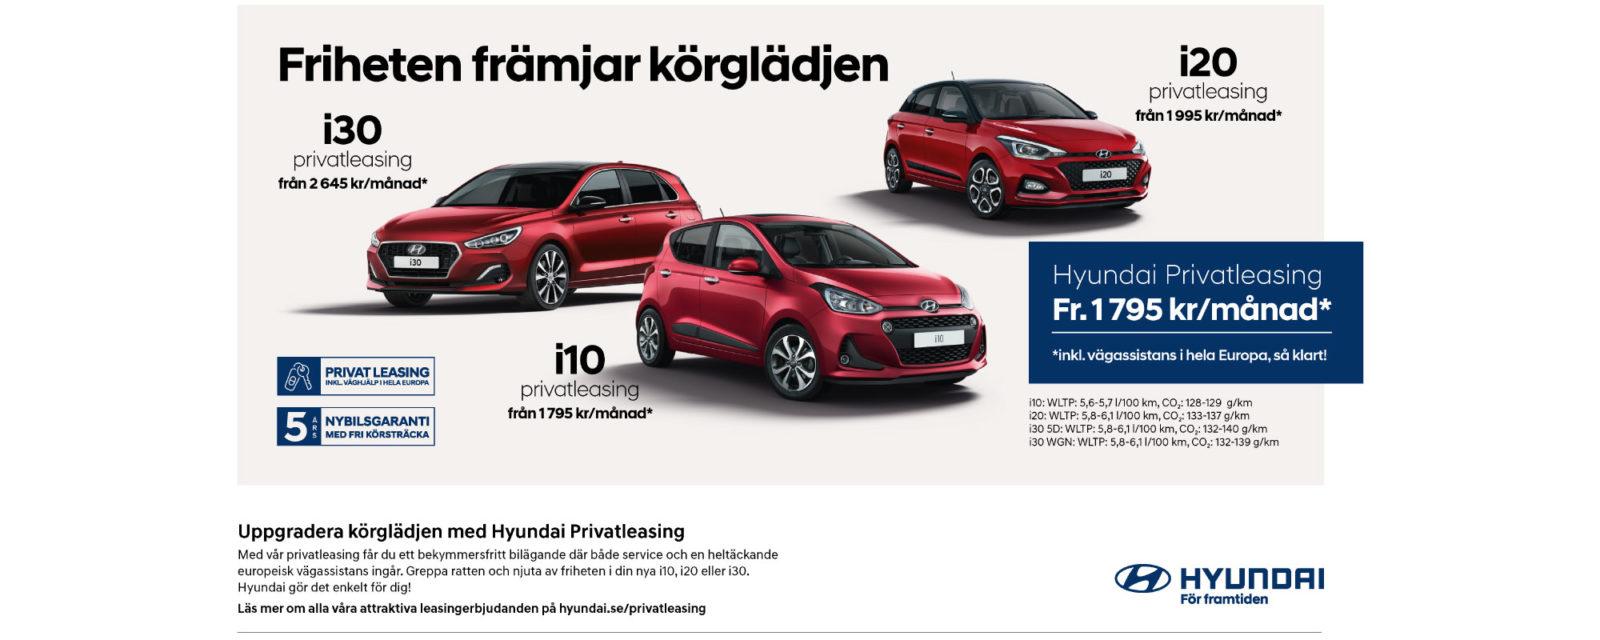 Privatlesing Hyundai